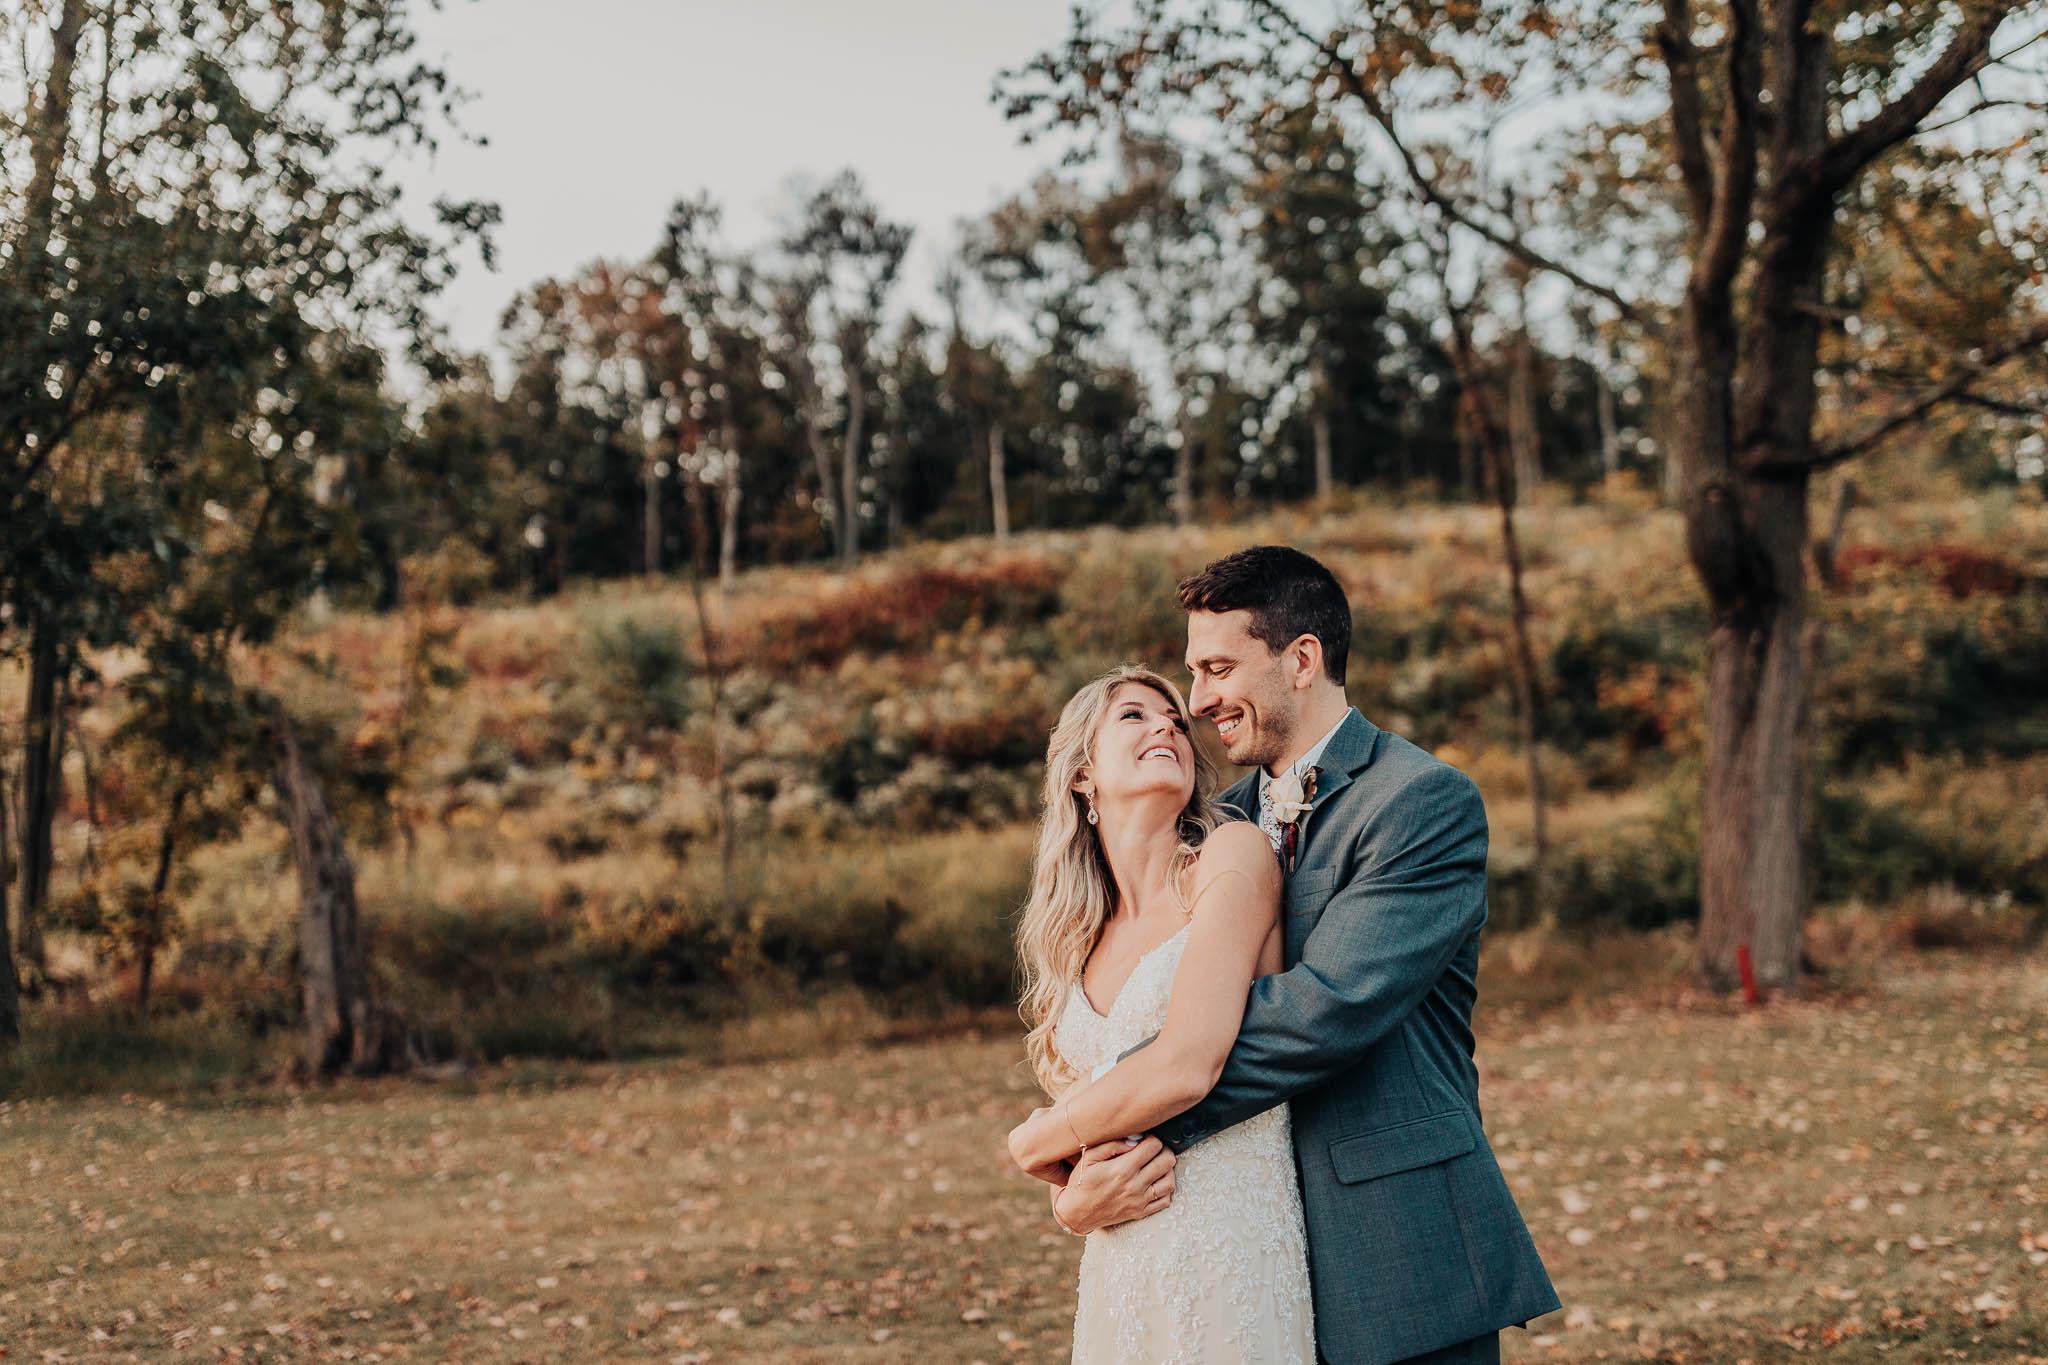 Frosty-Valley-September-Wedding-8231.jpg